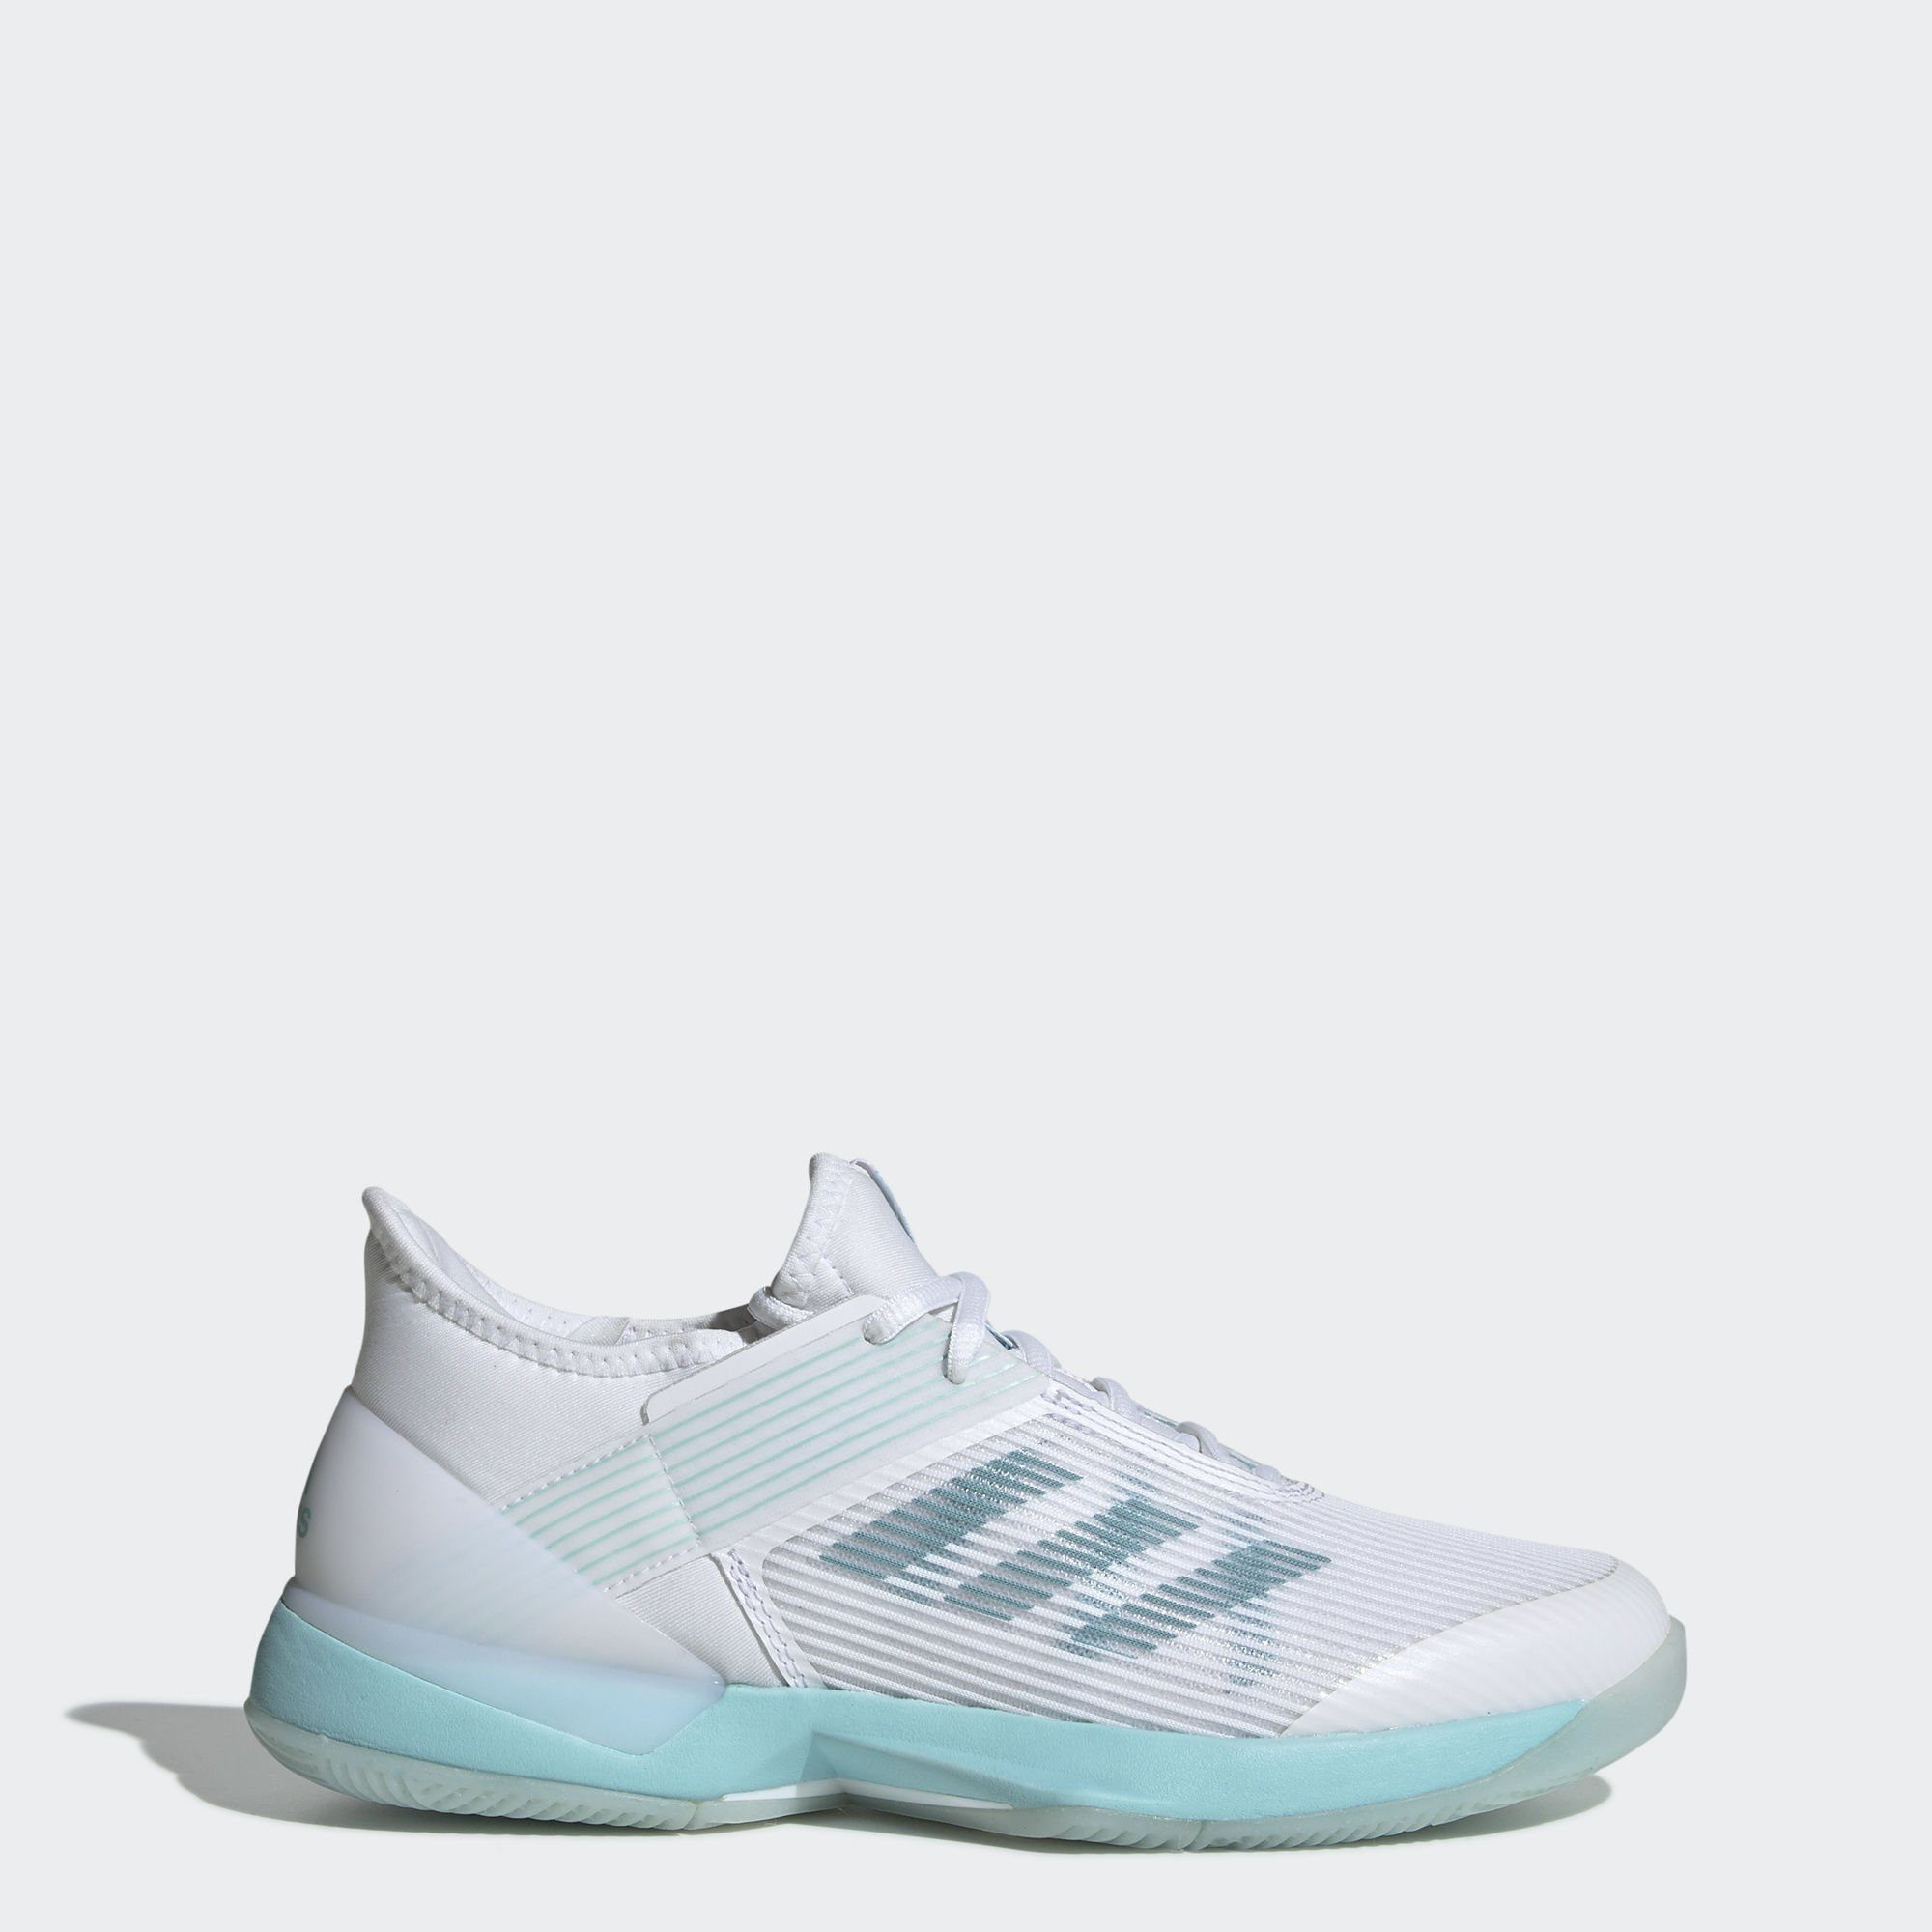 adidas Performance »Adizero Ubersonic 3 x Parley Schuh« Fitnessschuh adizero;Parley